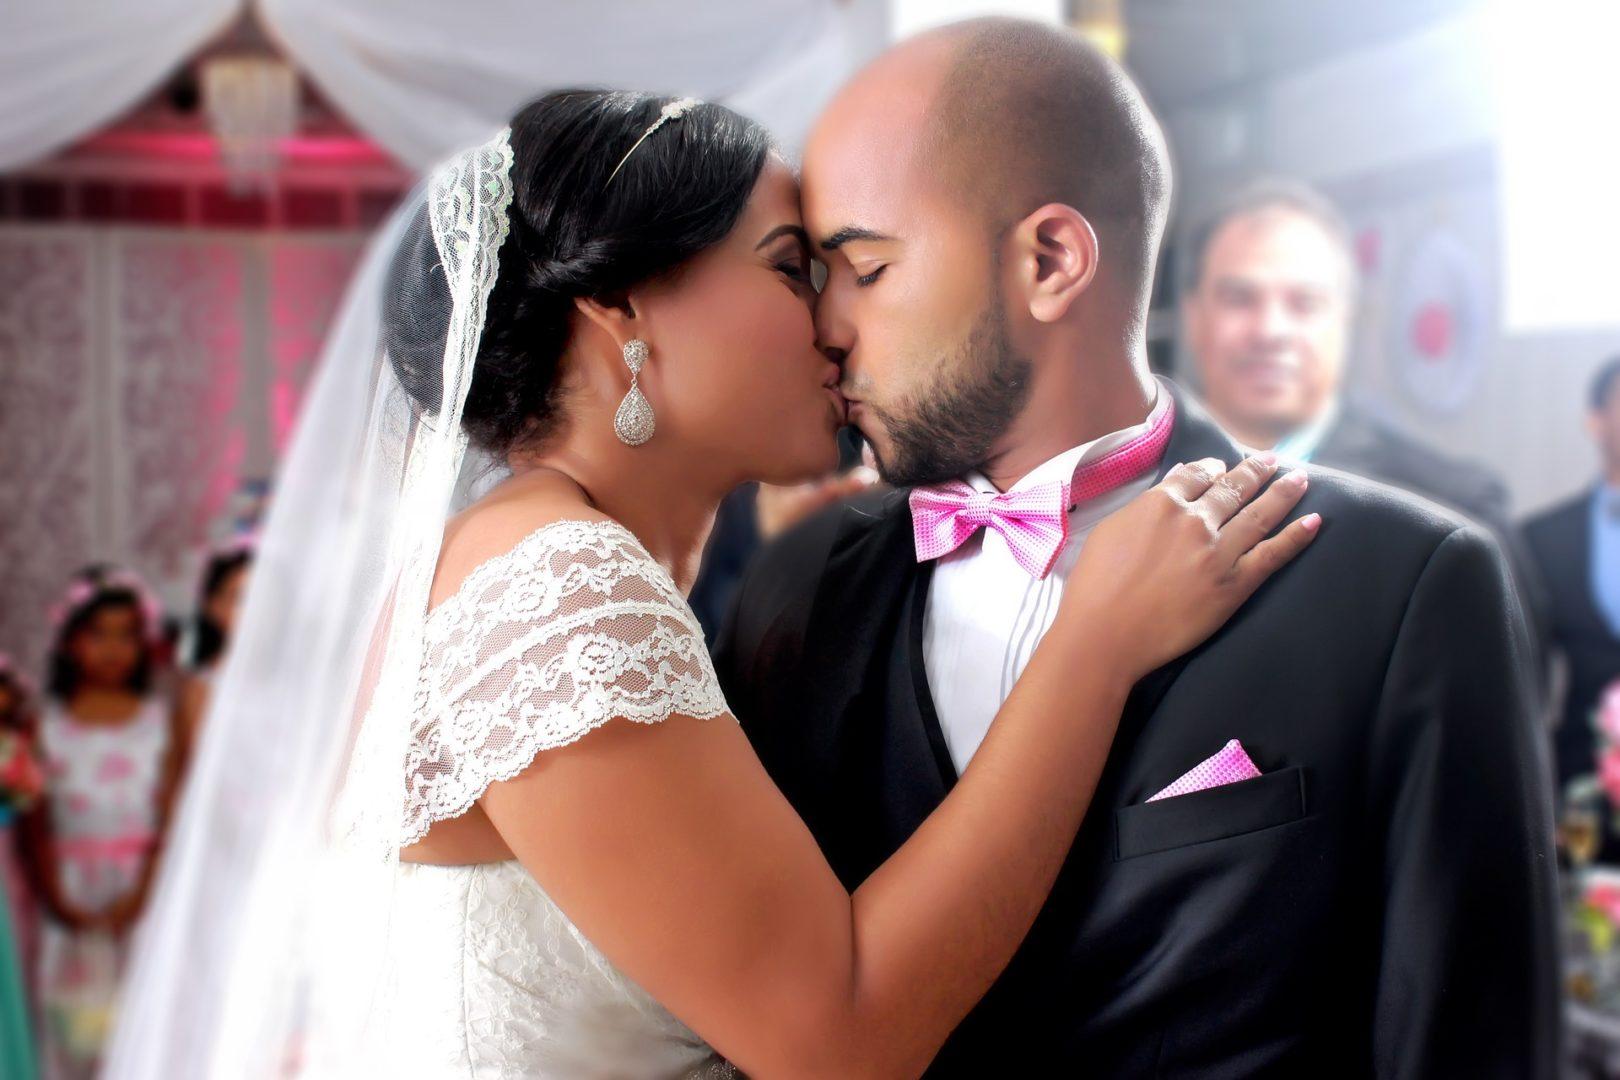 wedding-disaster-prevention-avoid-wannabe-photographers.